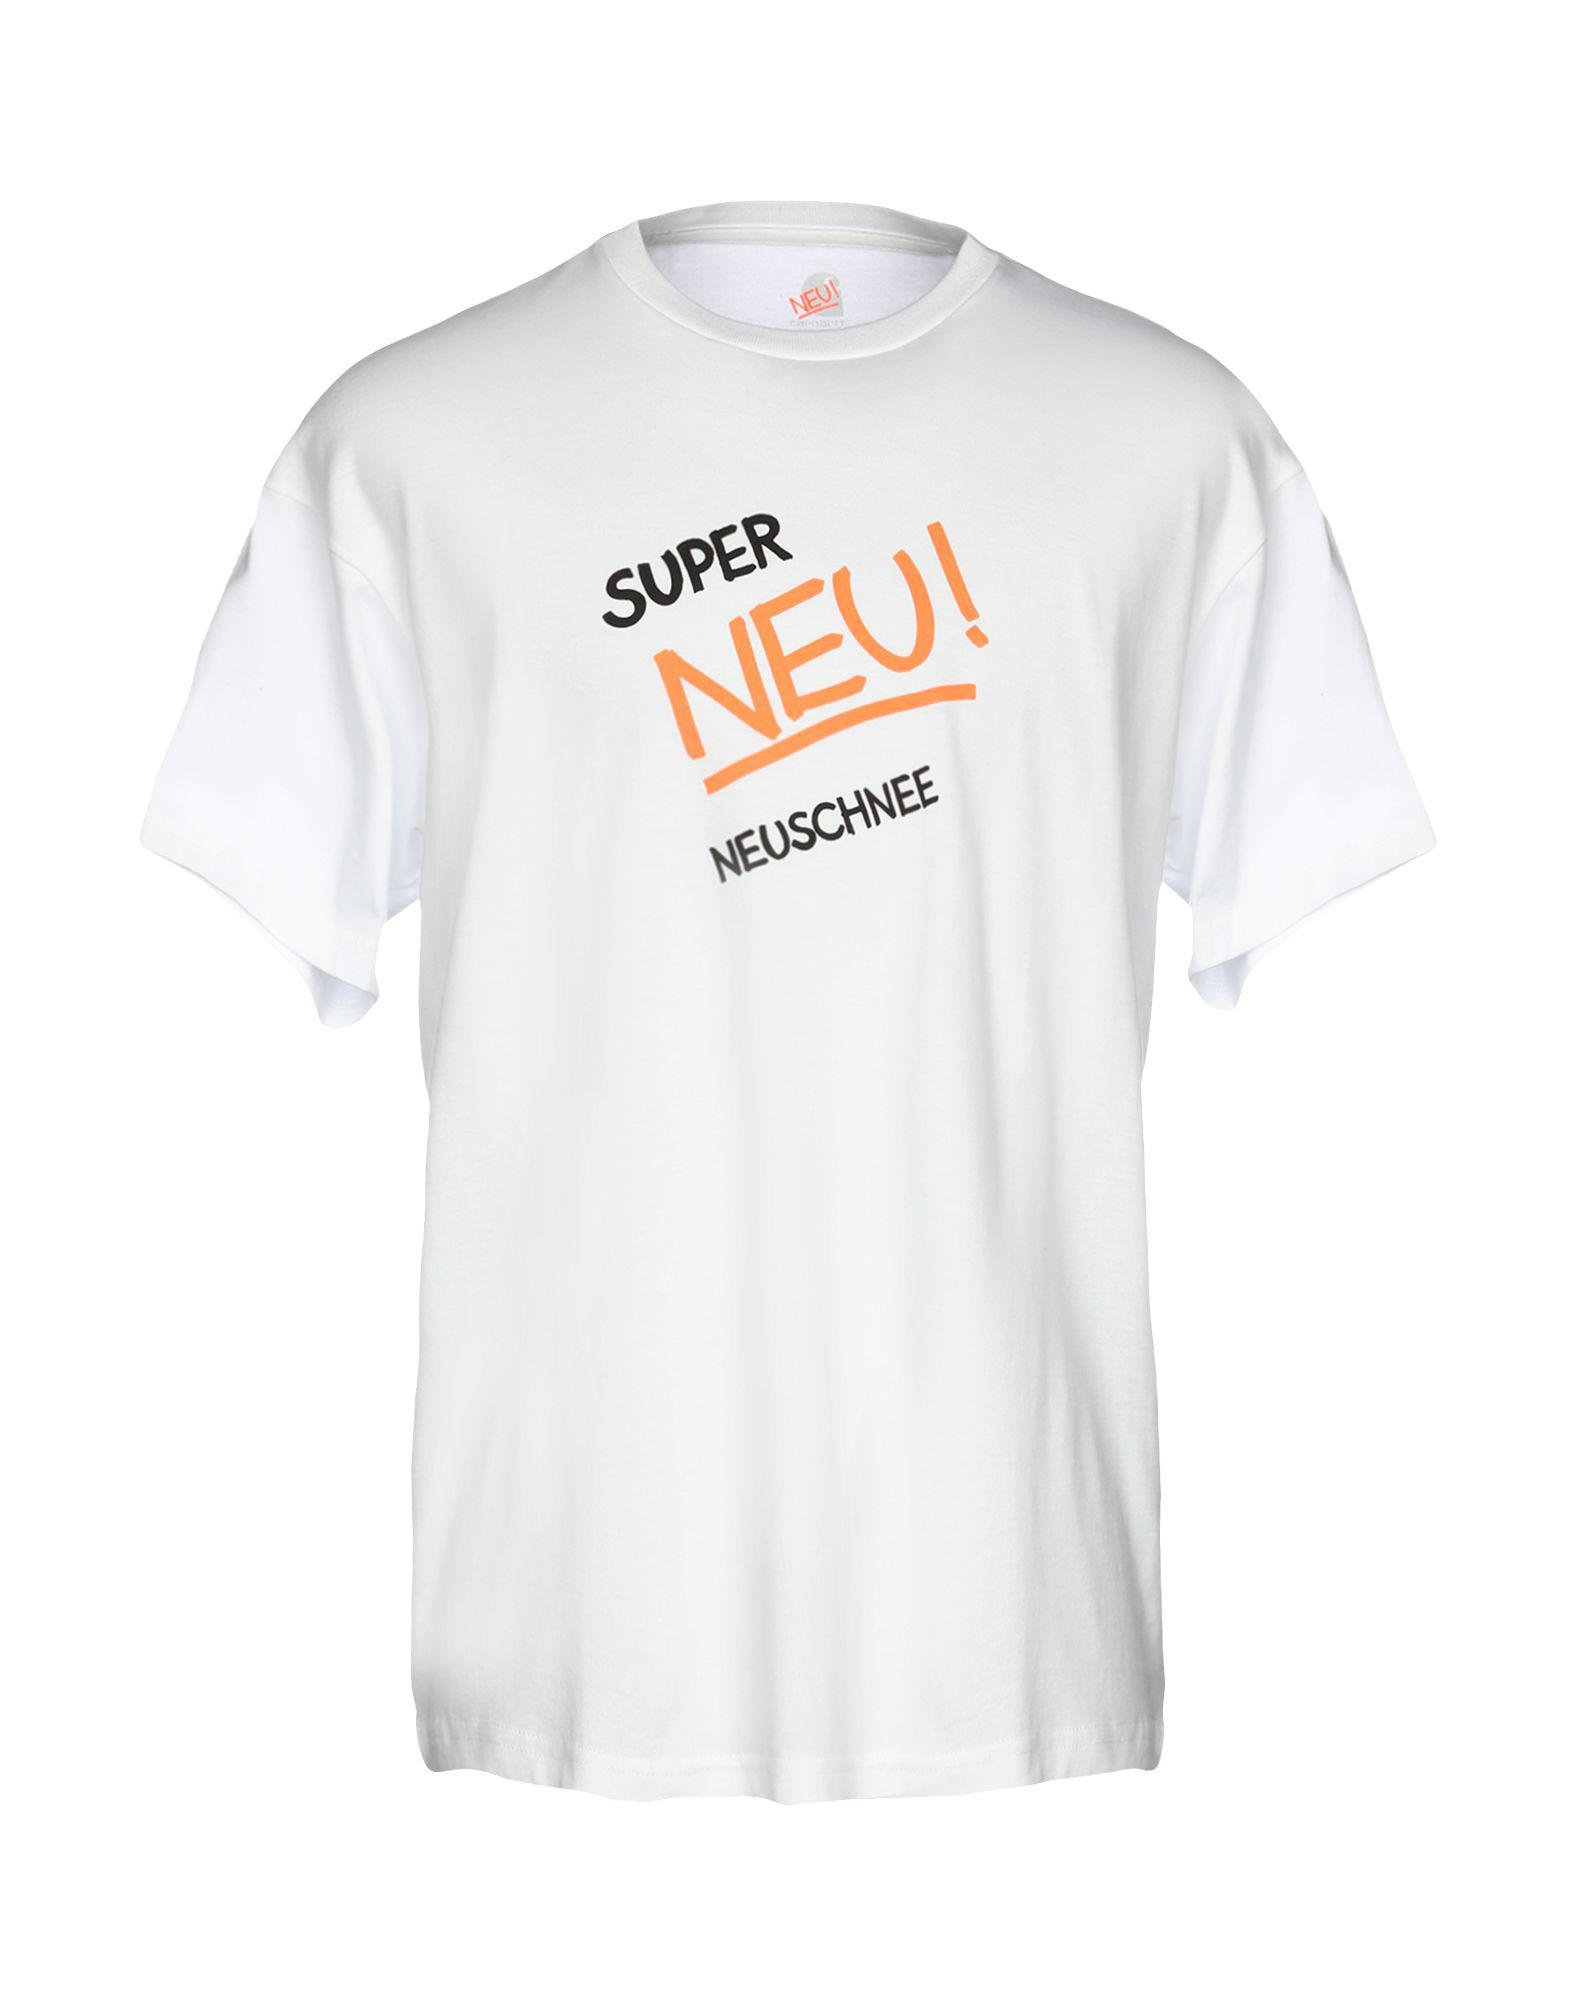 4f697b2a6 Lyst - Carhartt T-shirt in White for Men